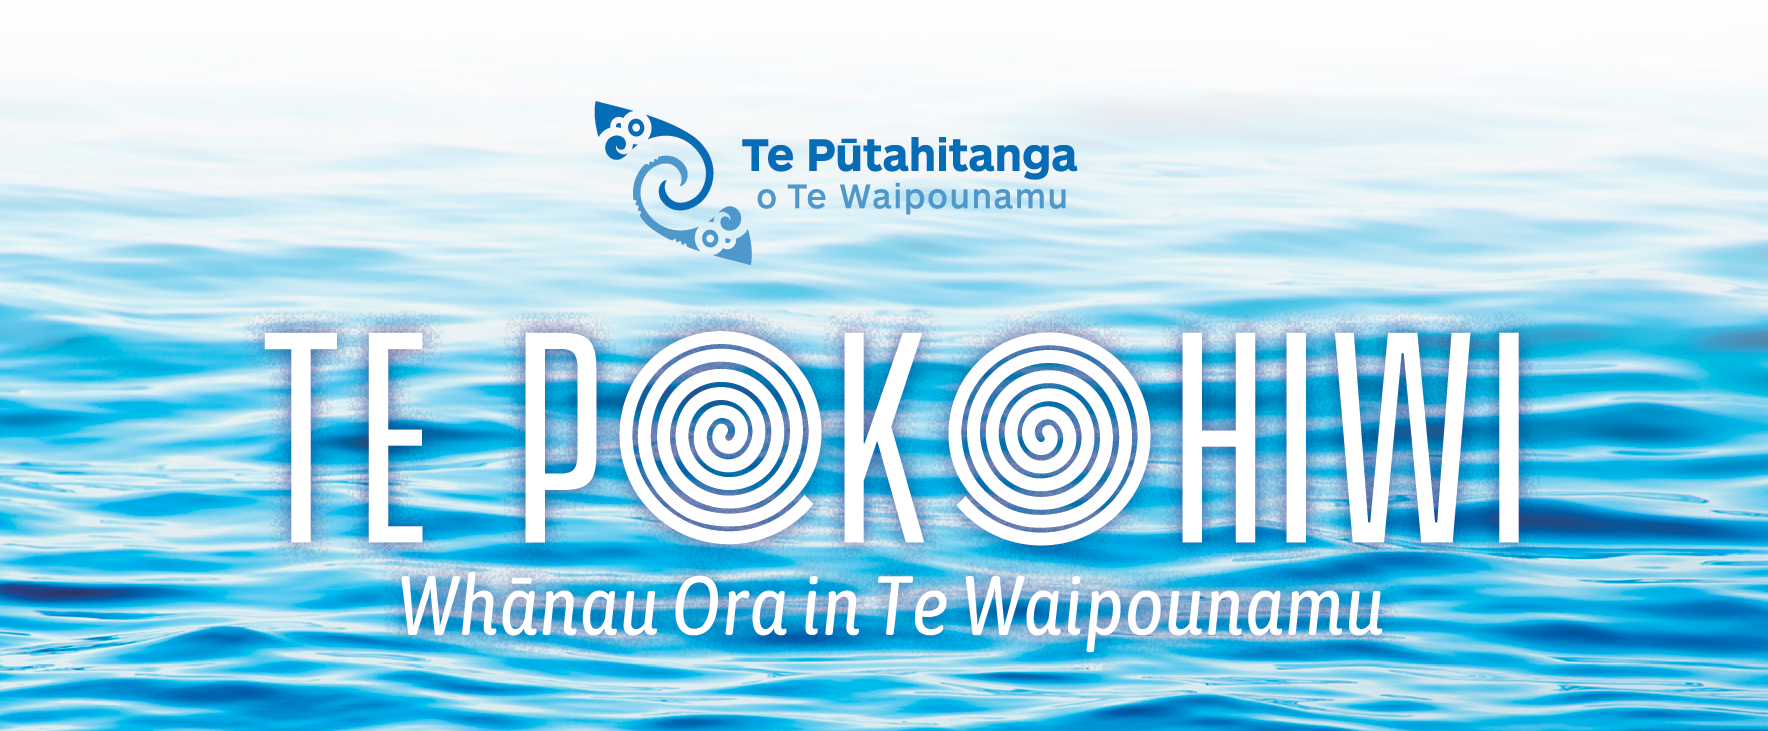 TePokohiwi.png